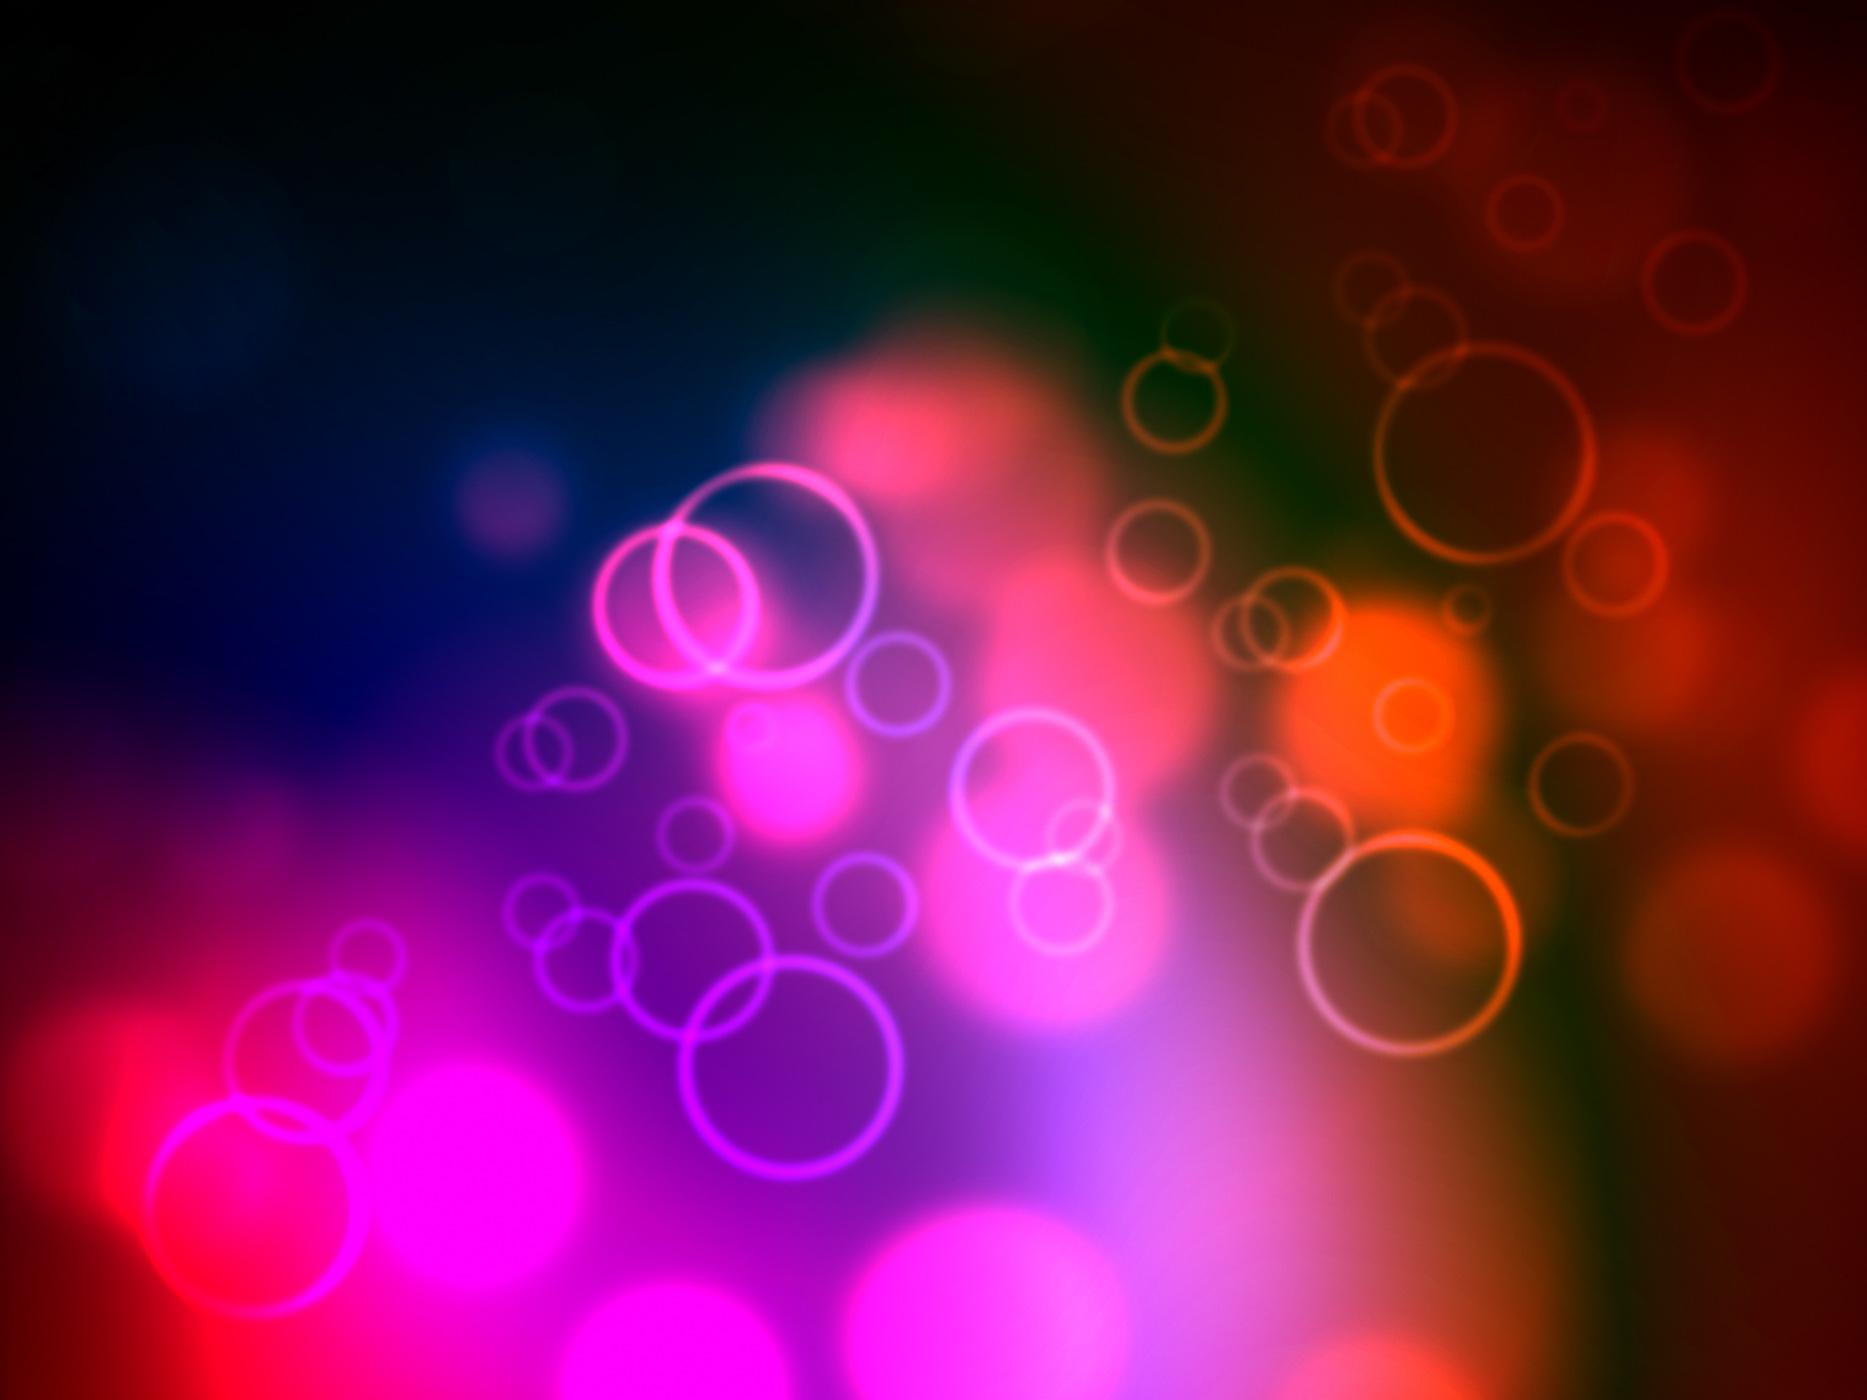 Background Bokeh Shows Light Burst And Abstract, Abstract, Glare, Lightburst, Light, HQ Photo